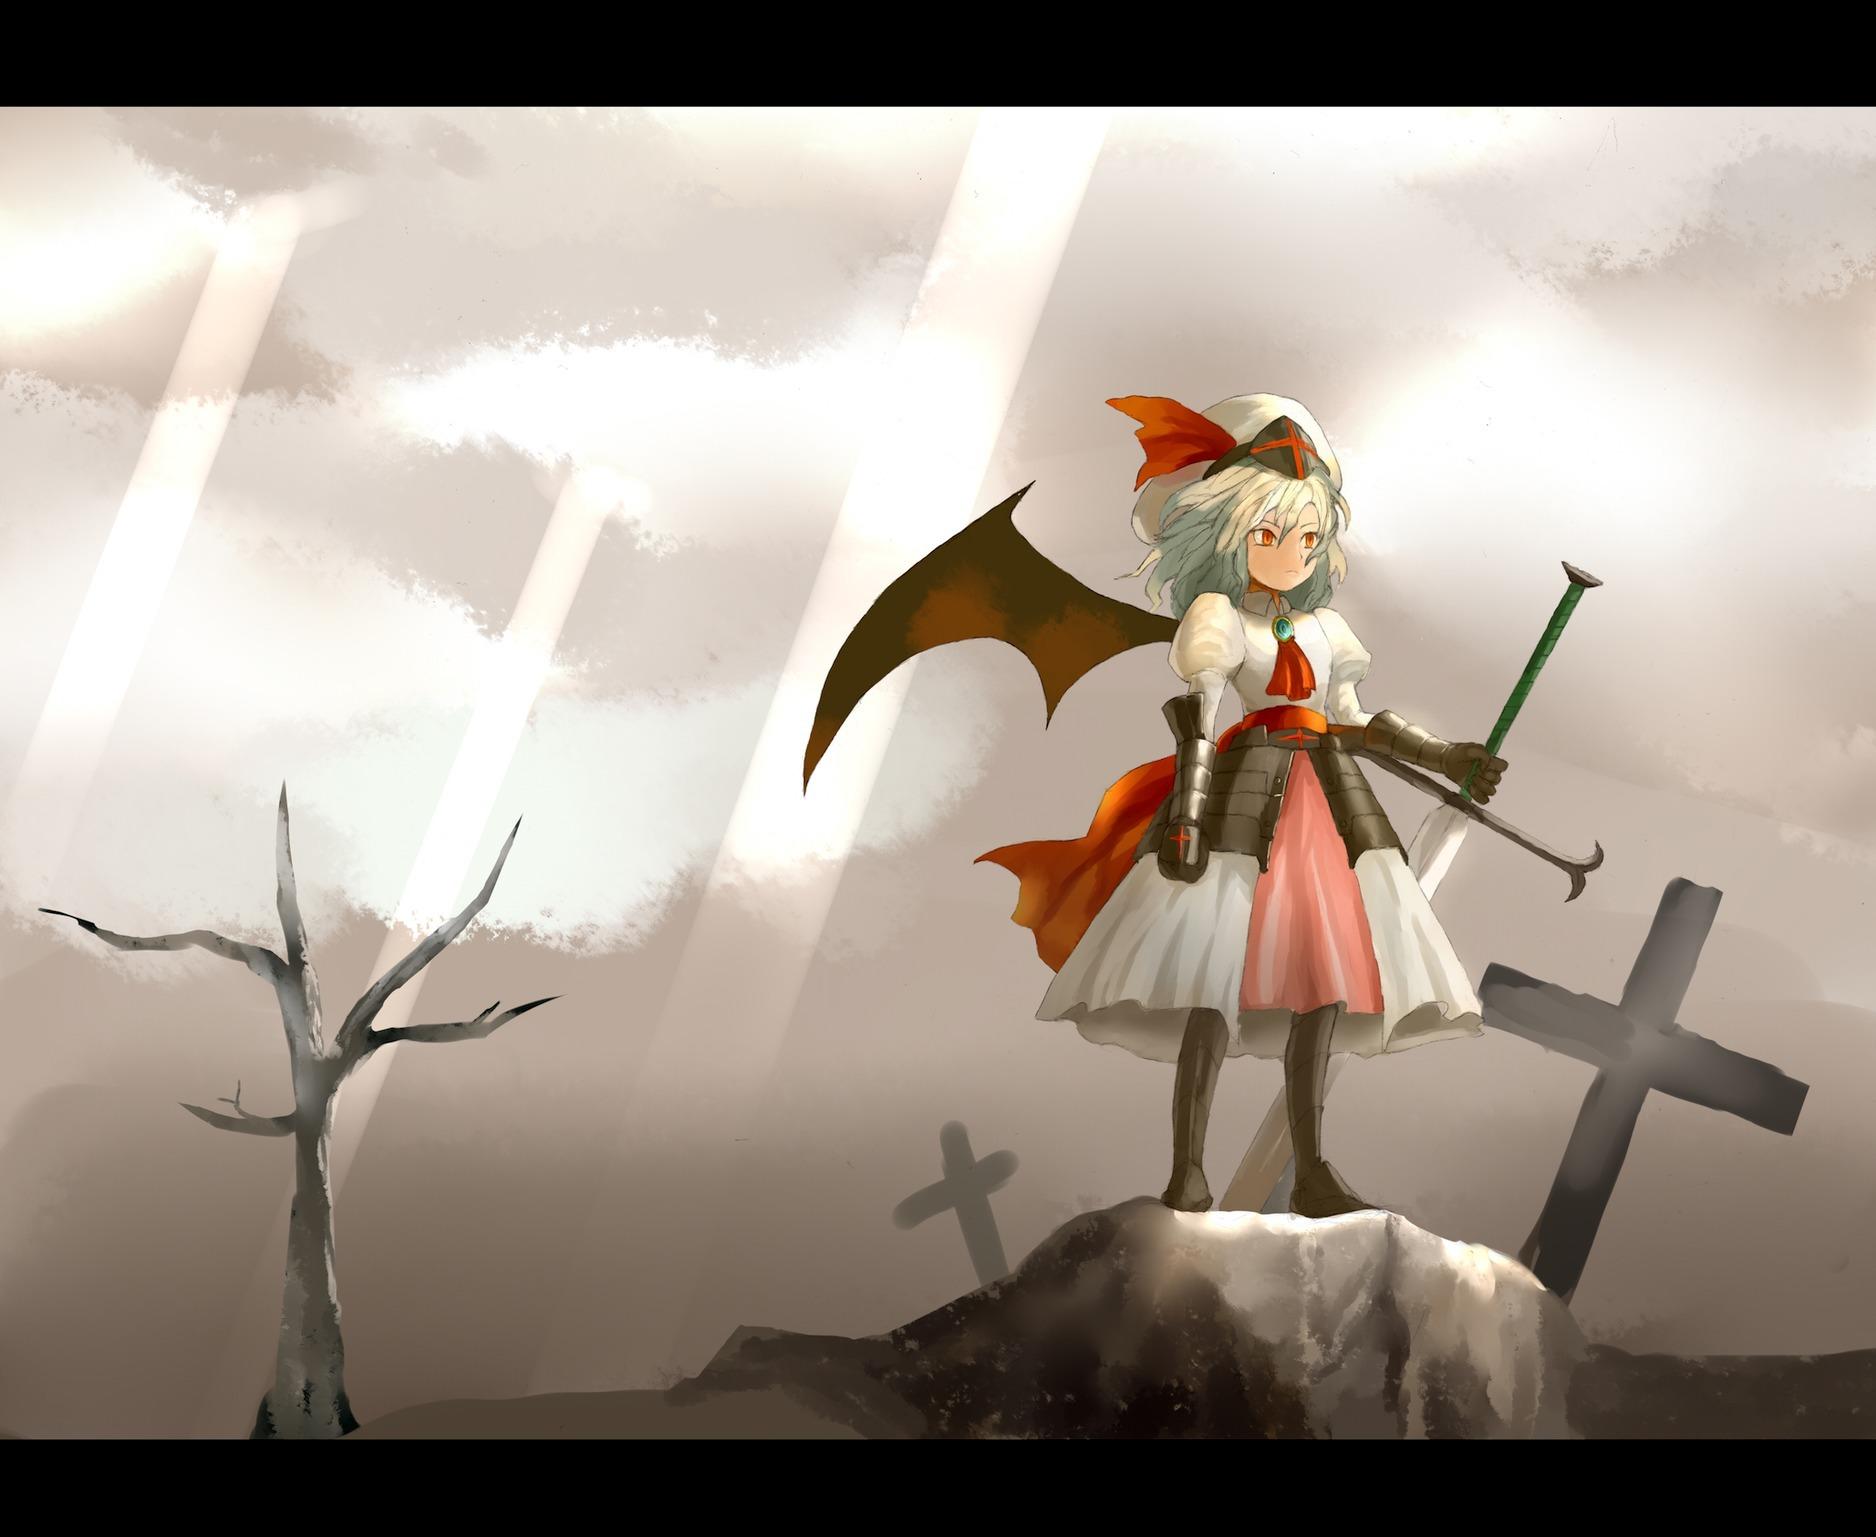 armor cross remilia_scarlet sky sword touhou vampire weapon wings